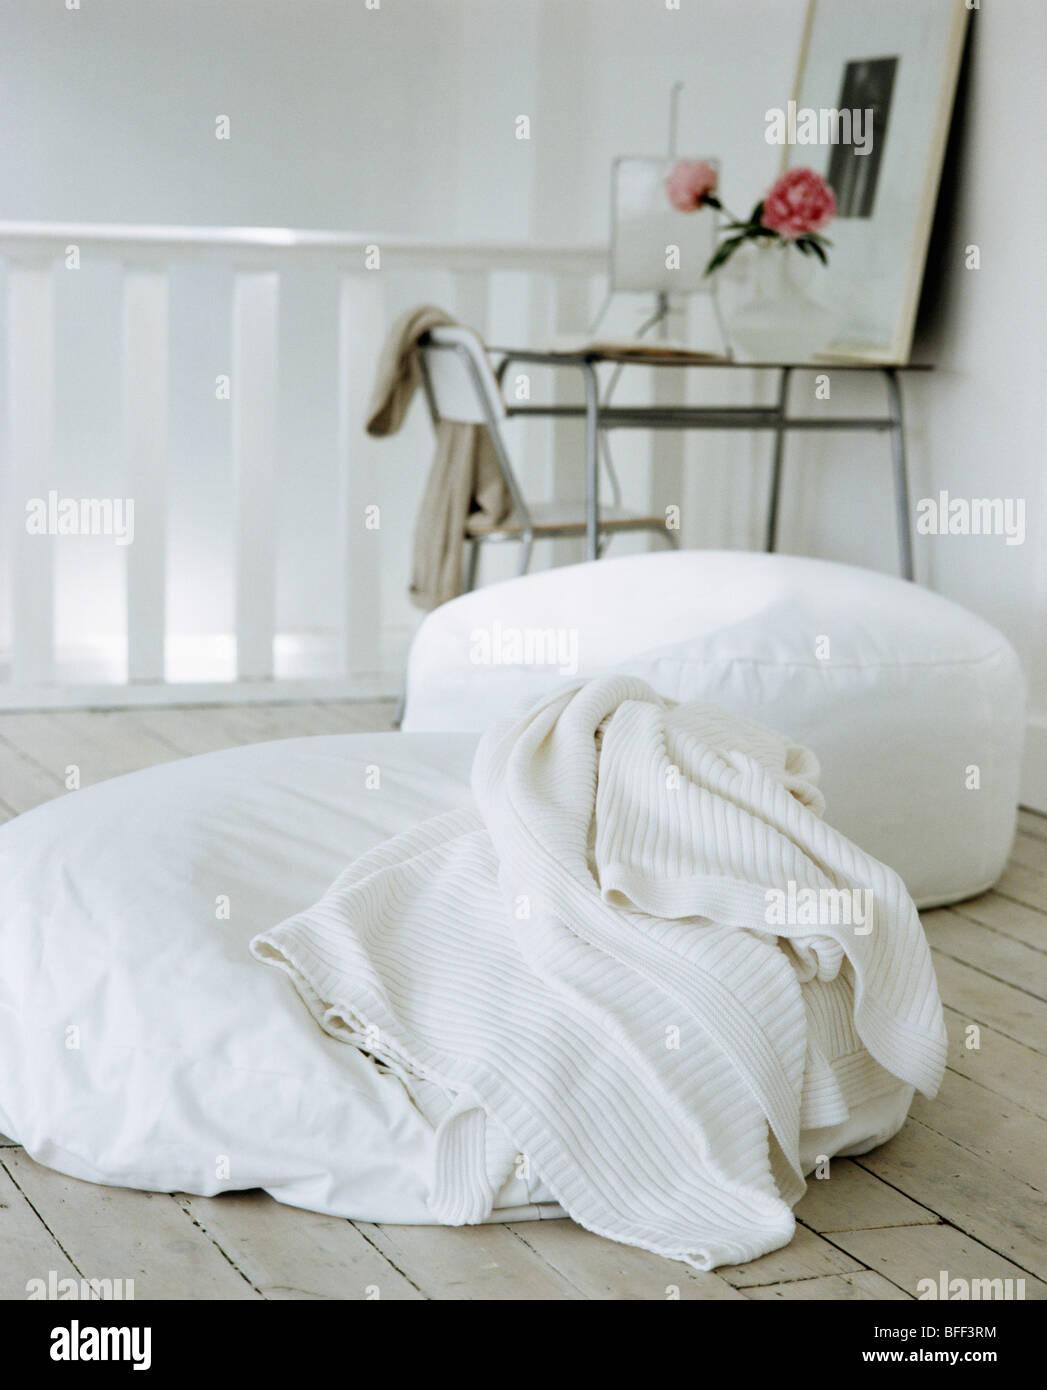 ikea seating home floor design cushions ideas